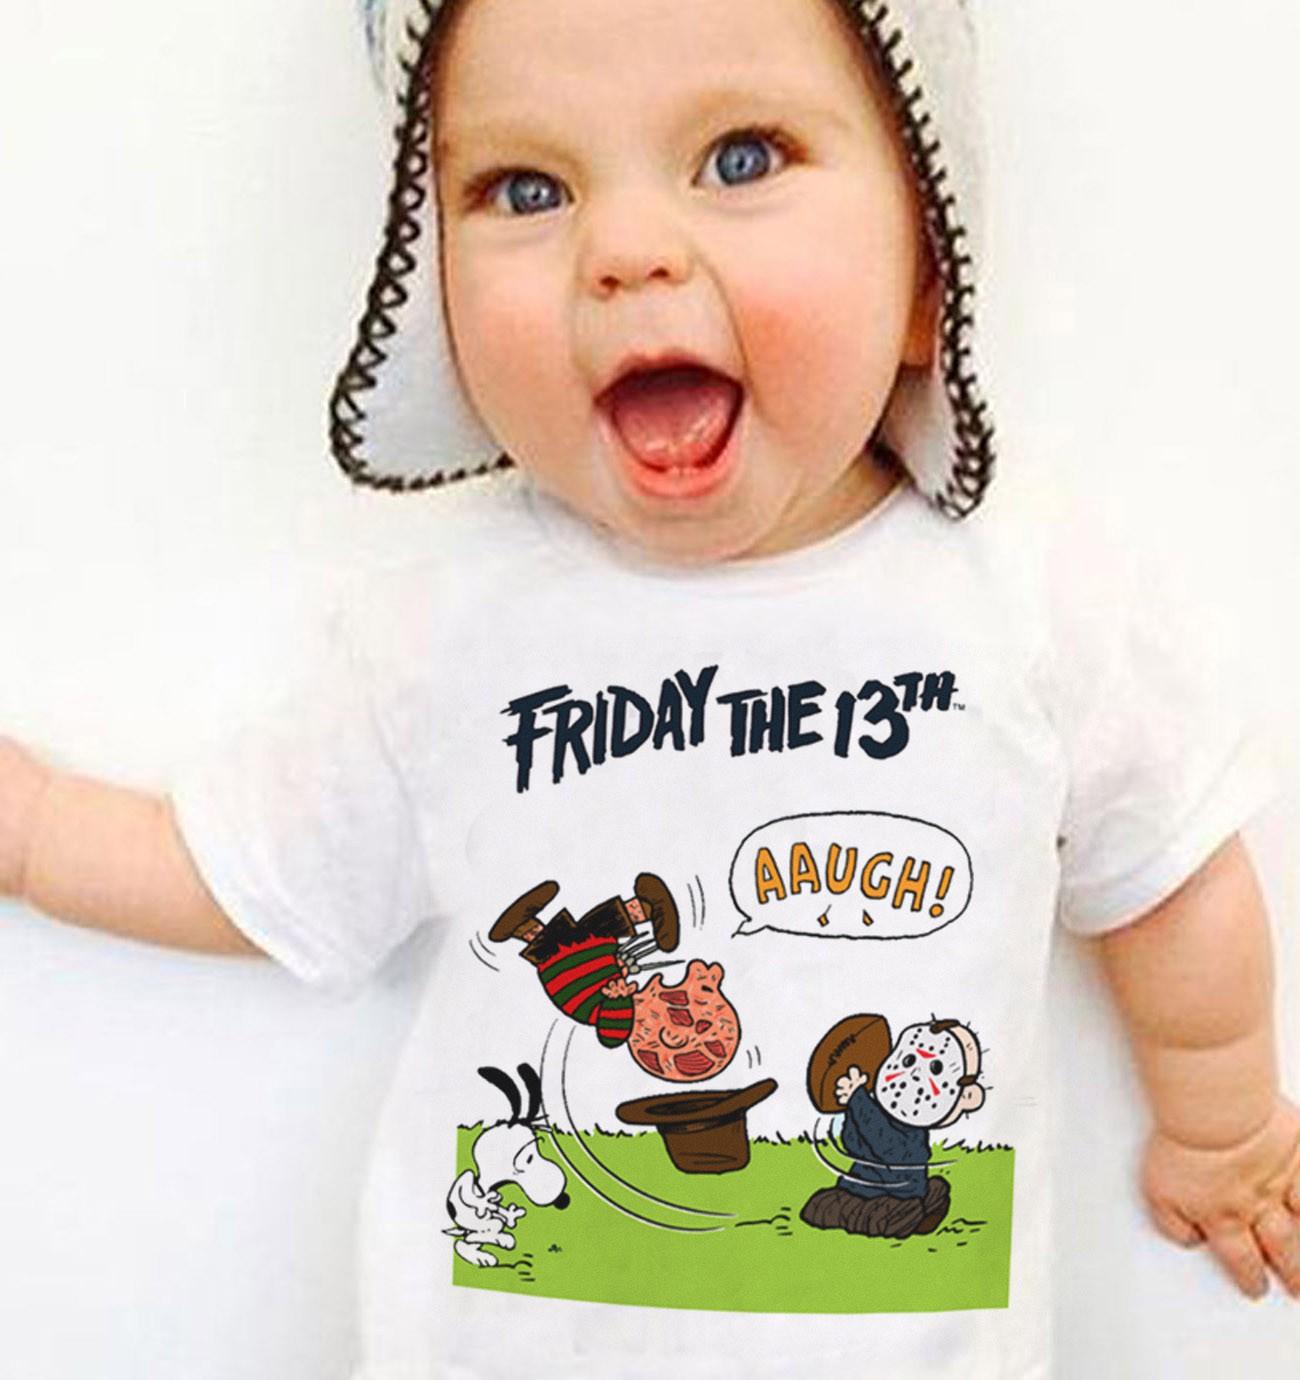 Camiseta Infantil Snoopy Sexta feira 13  - Baby Monster S/A